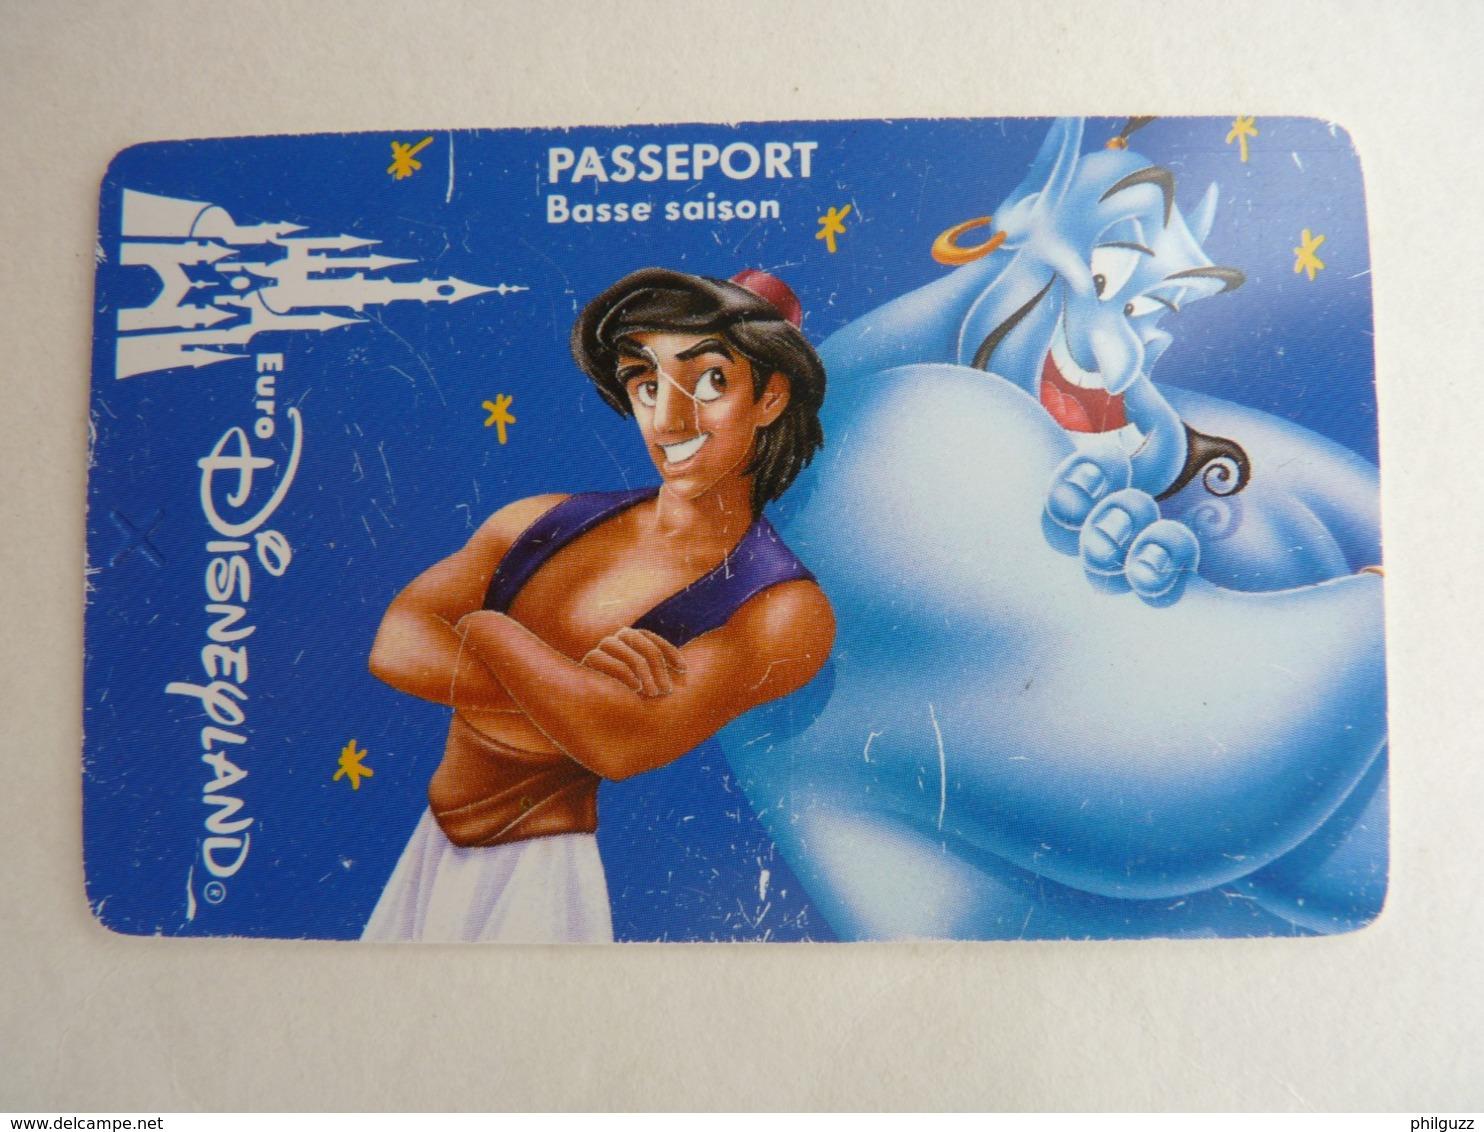 BILLET D'ENTREE CARTE PASS WALT DISNEY PARC EURODISNEY 020 DISNEYLAND ALADIN Basse Saison - Tickets - Entradas